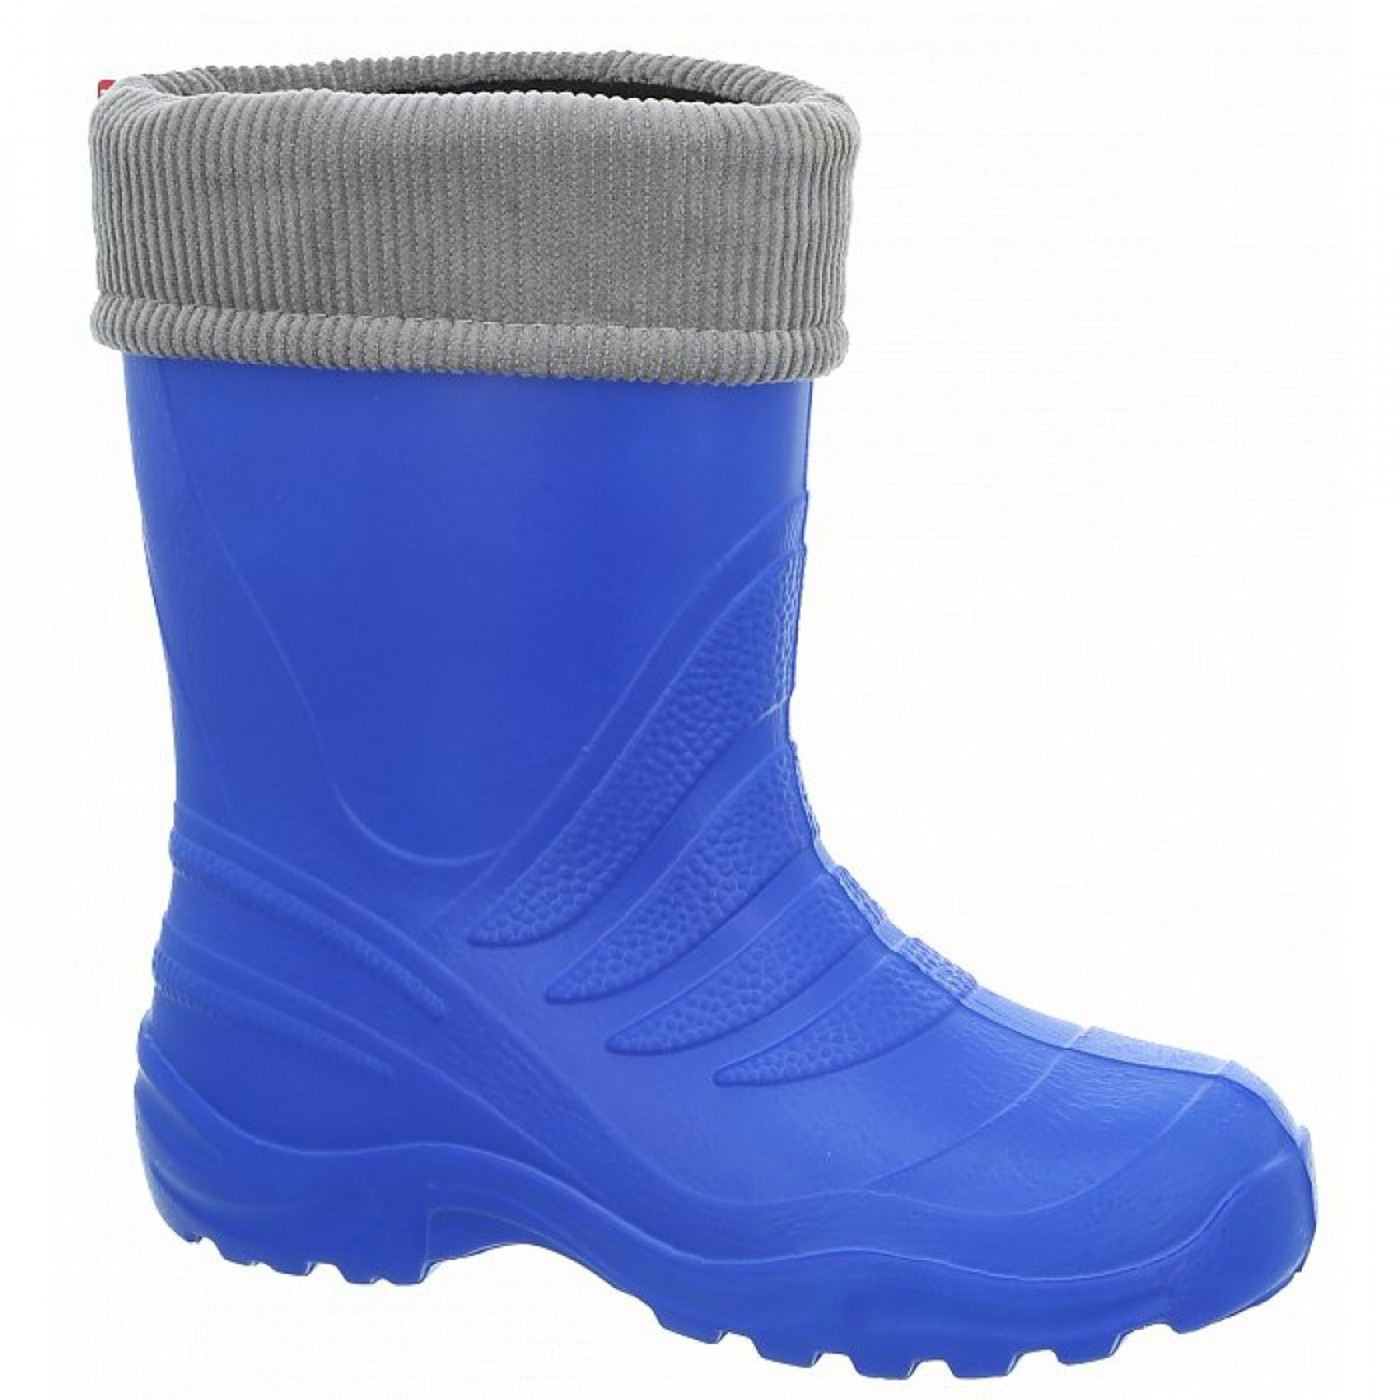 HIGH COLORADO Winter Boots BOBBY - Kinder